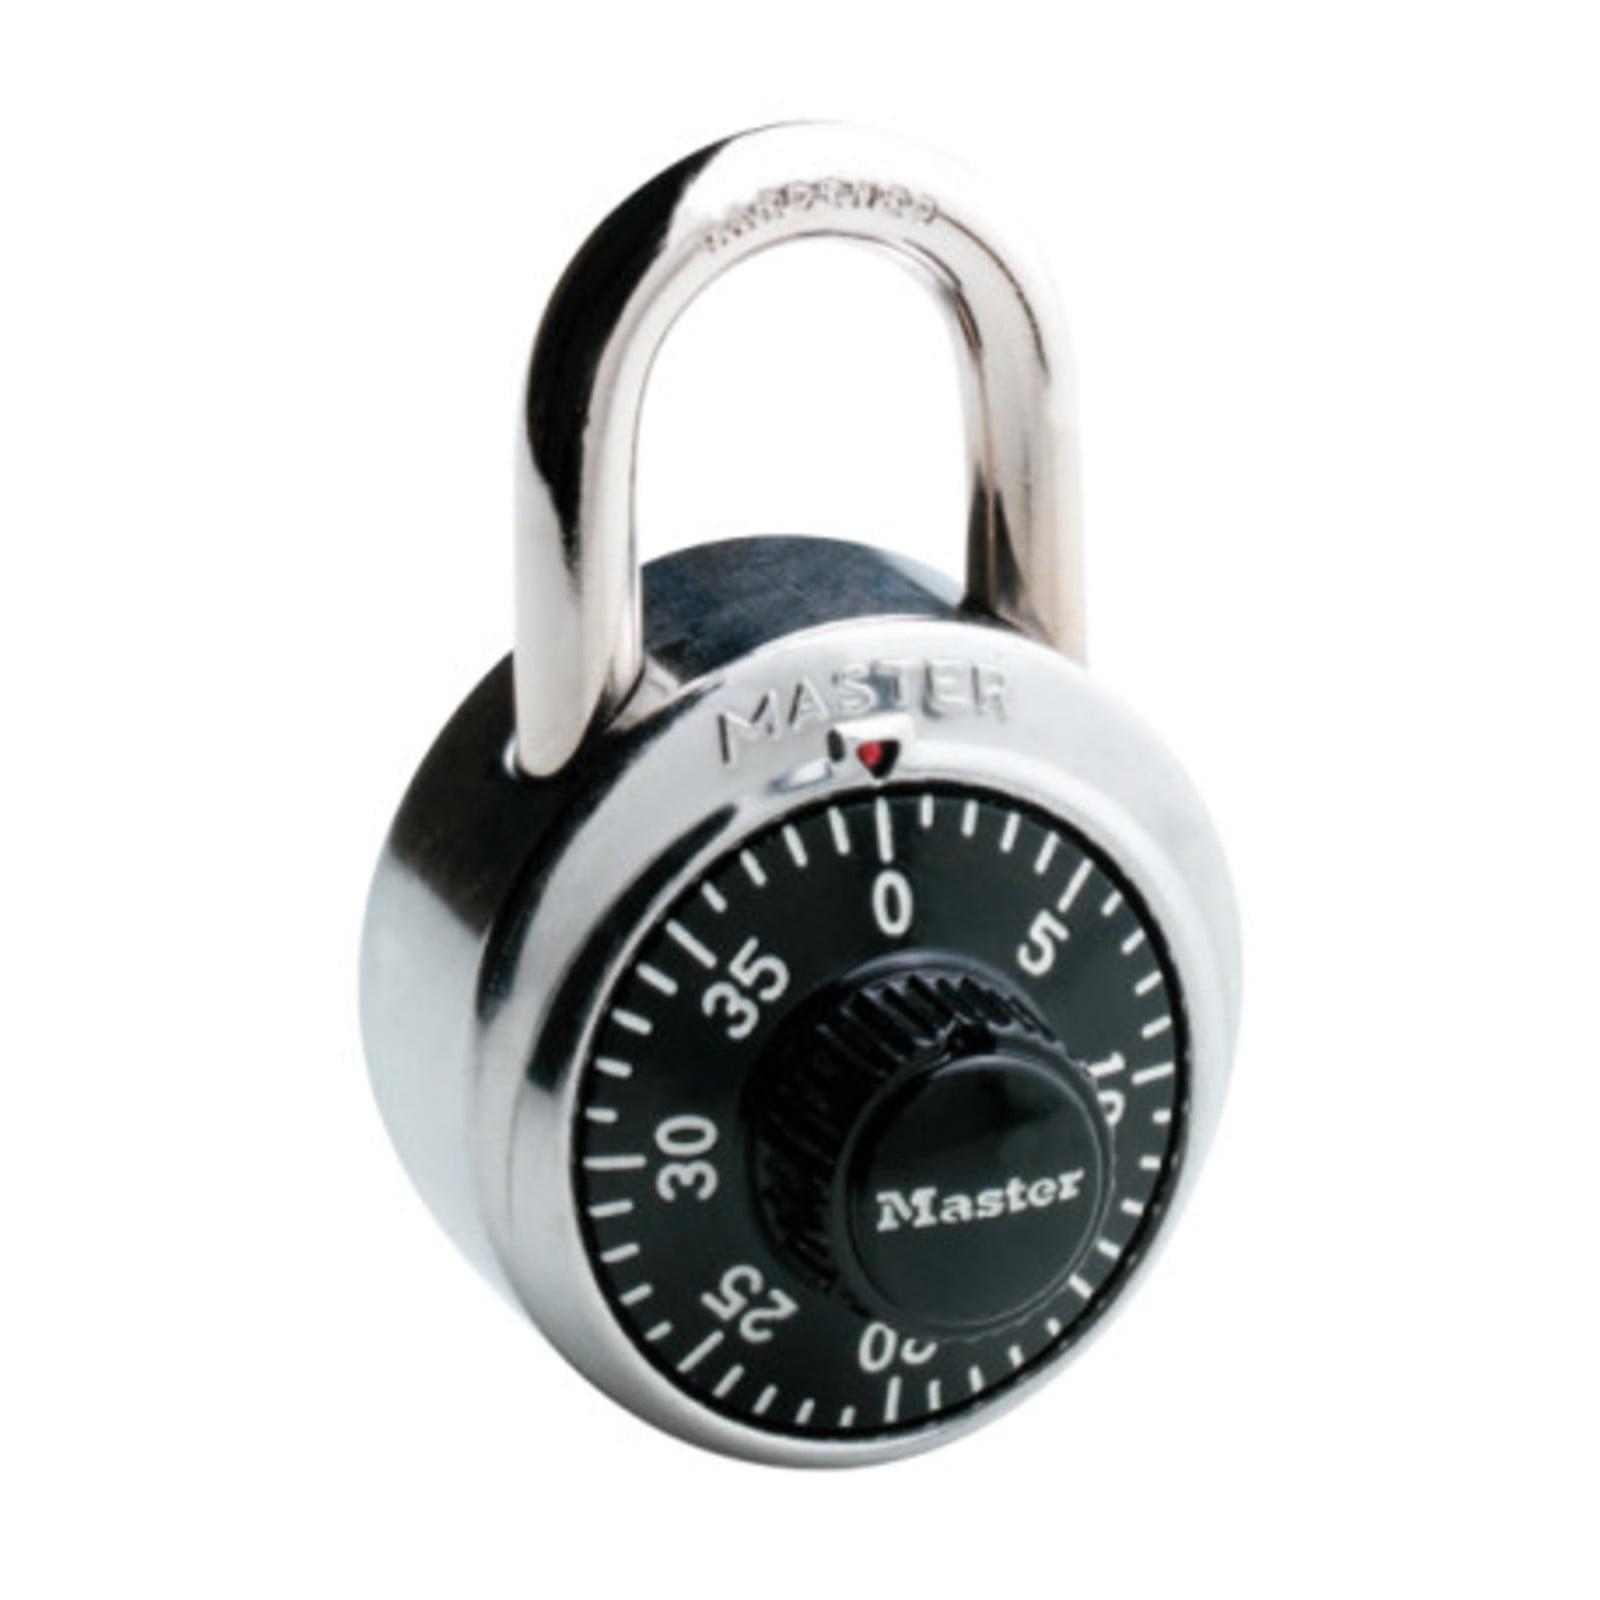 Master 20741430 Master Lock Dial Combination Lock, 1-7 8-Inch, Black by Master Lock